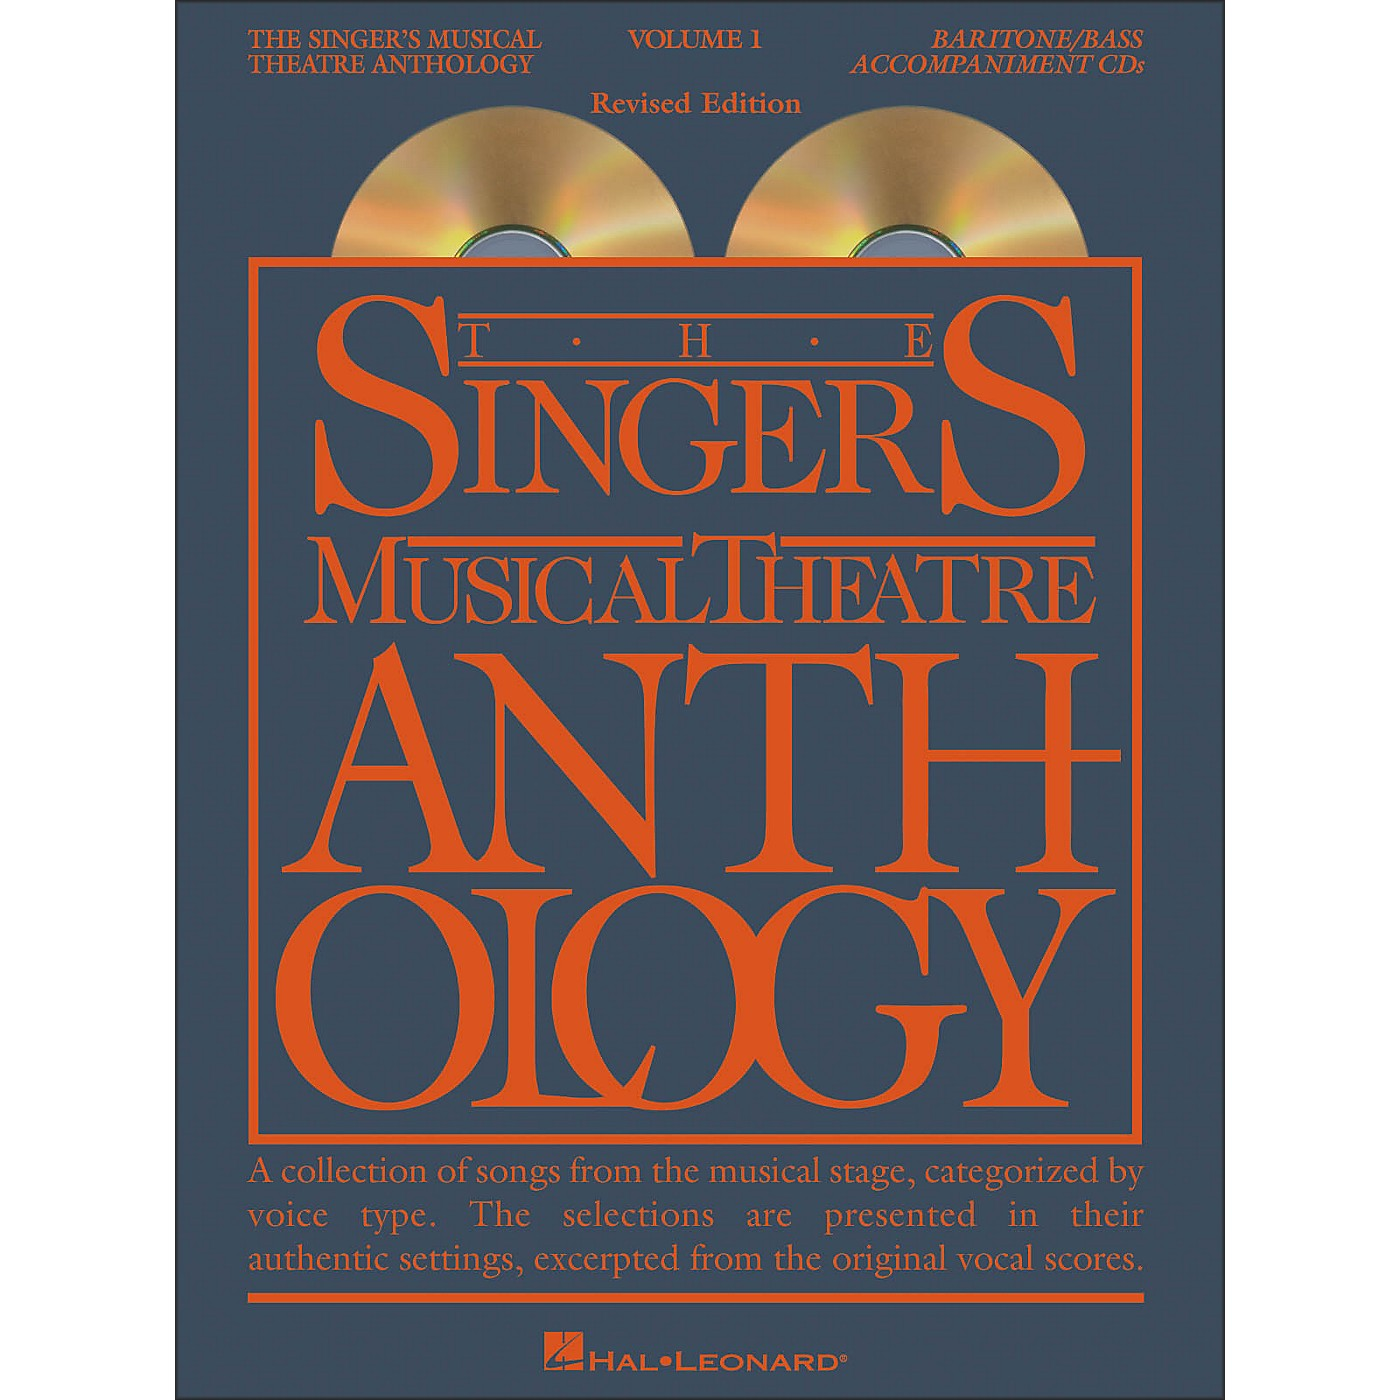 Hal Leonard Singer's Musical Theatre Anthology for Baritone / Bass Volume 1 2CD's thumbnail